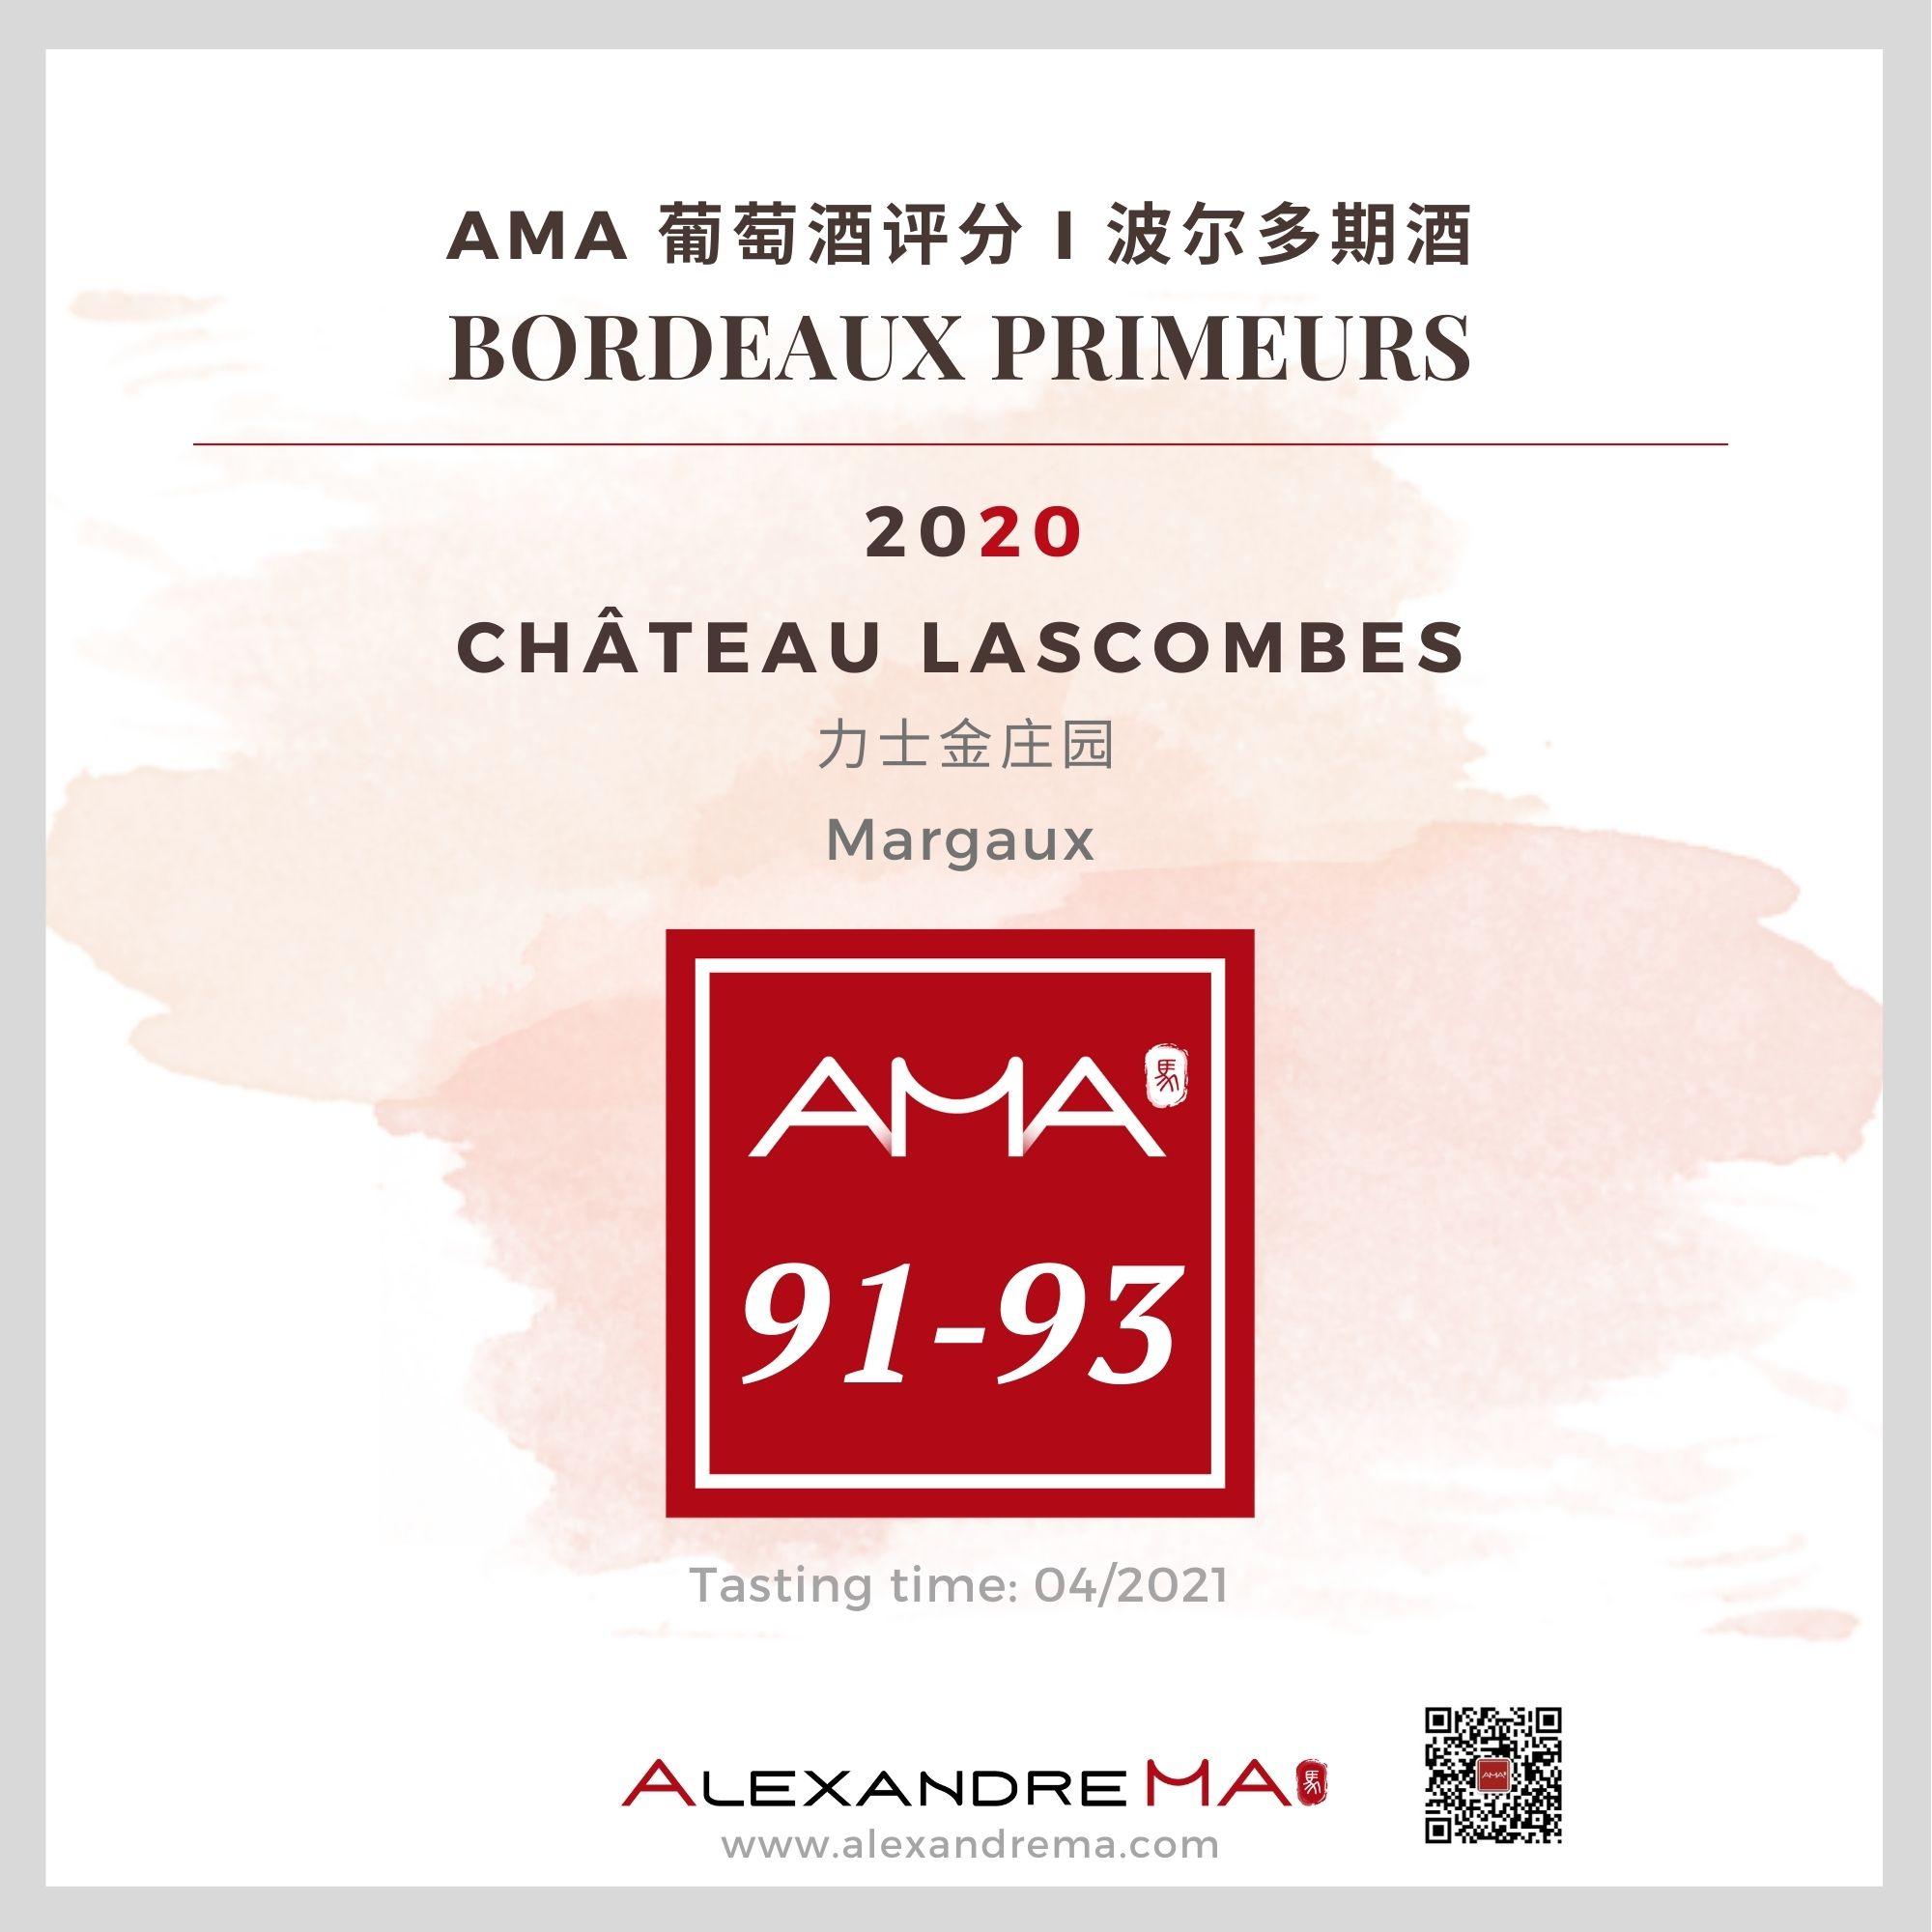 Château Lascombes 2020 力士金庄园 - Alexandre Ma